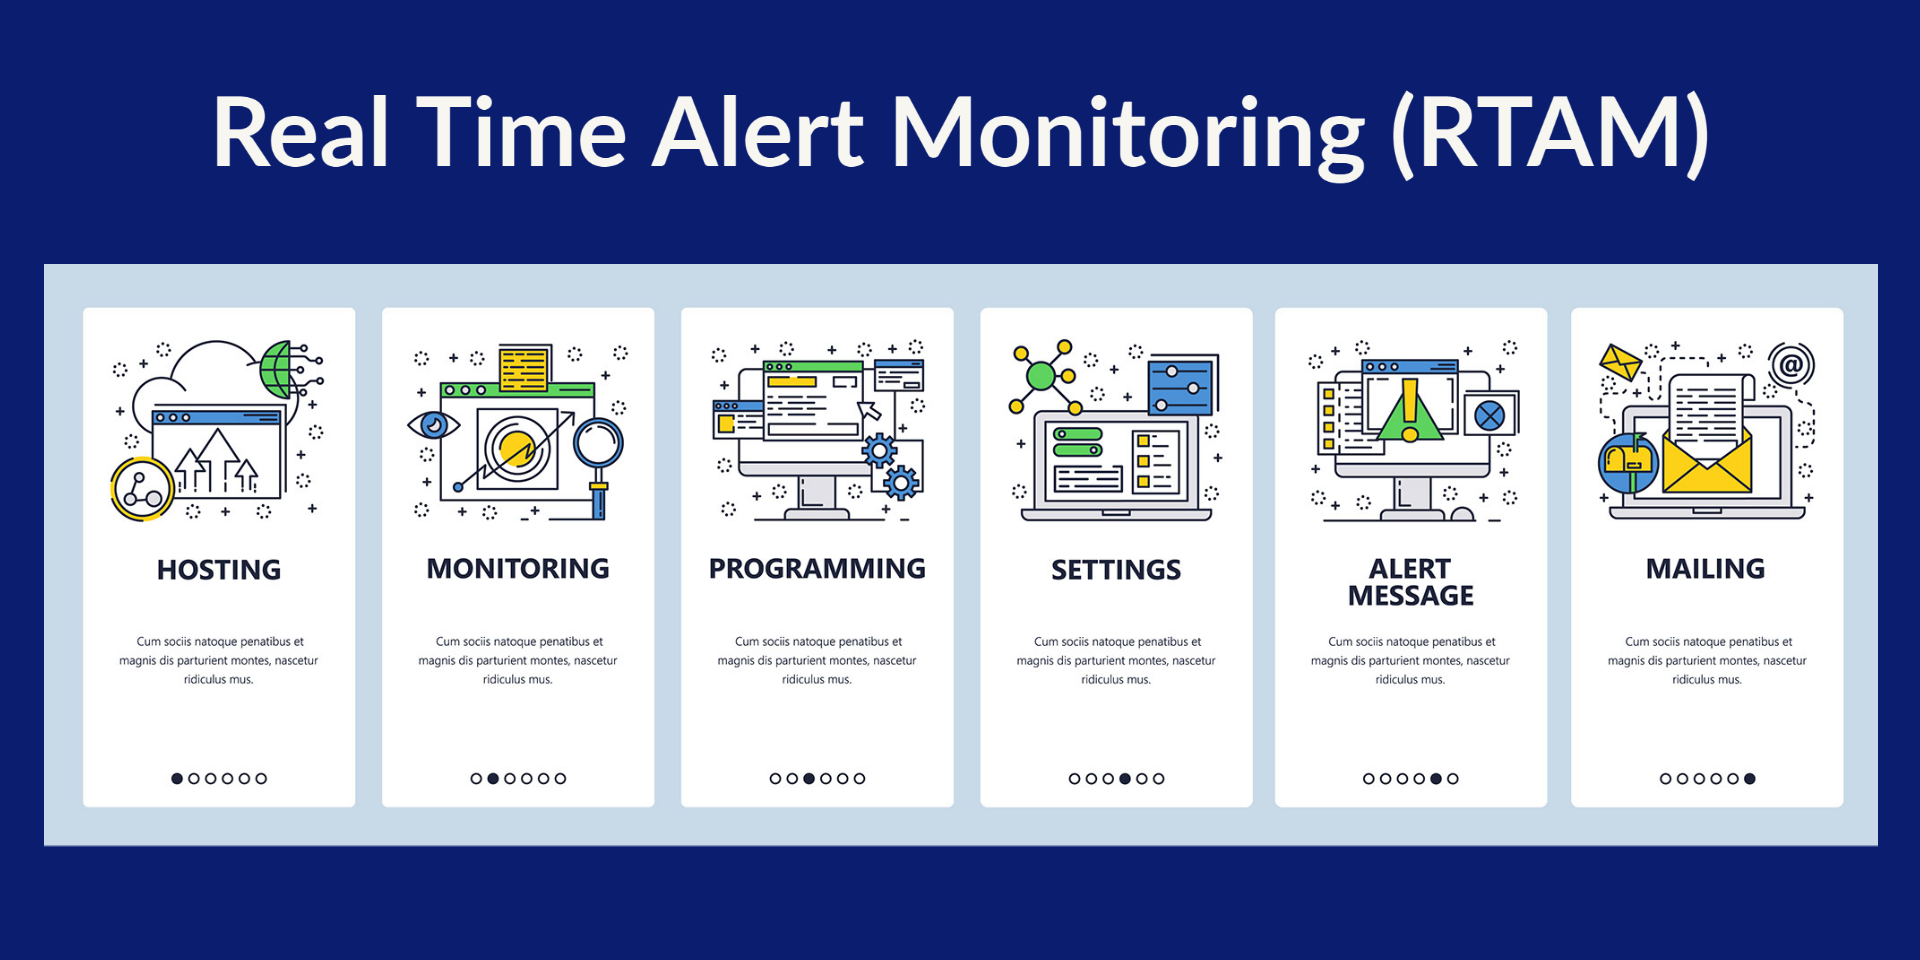 Real Time Alert Monitoring